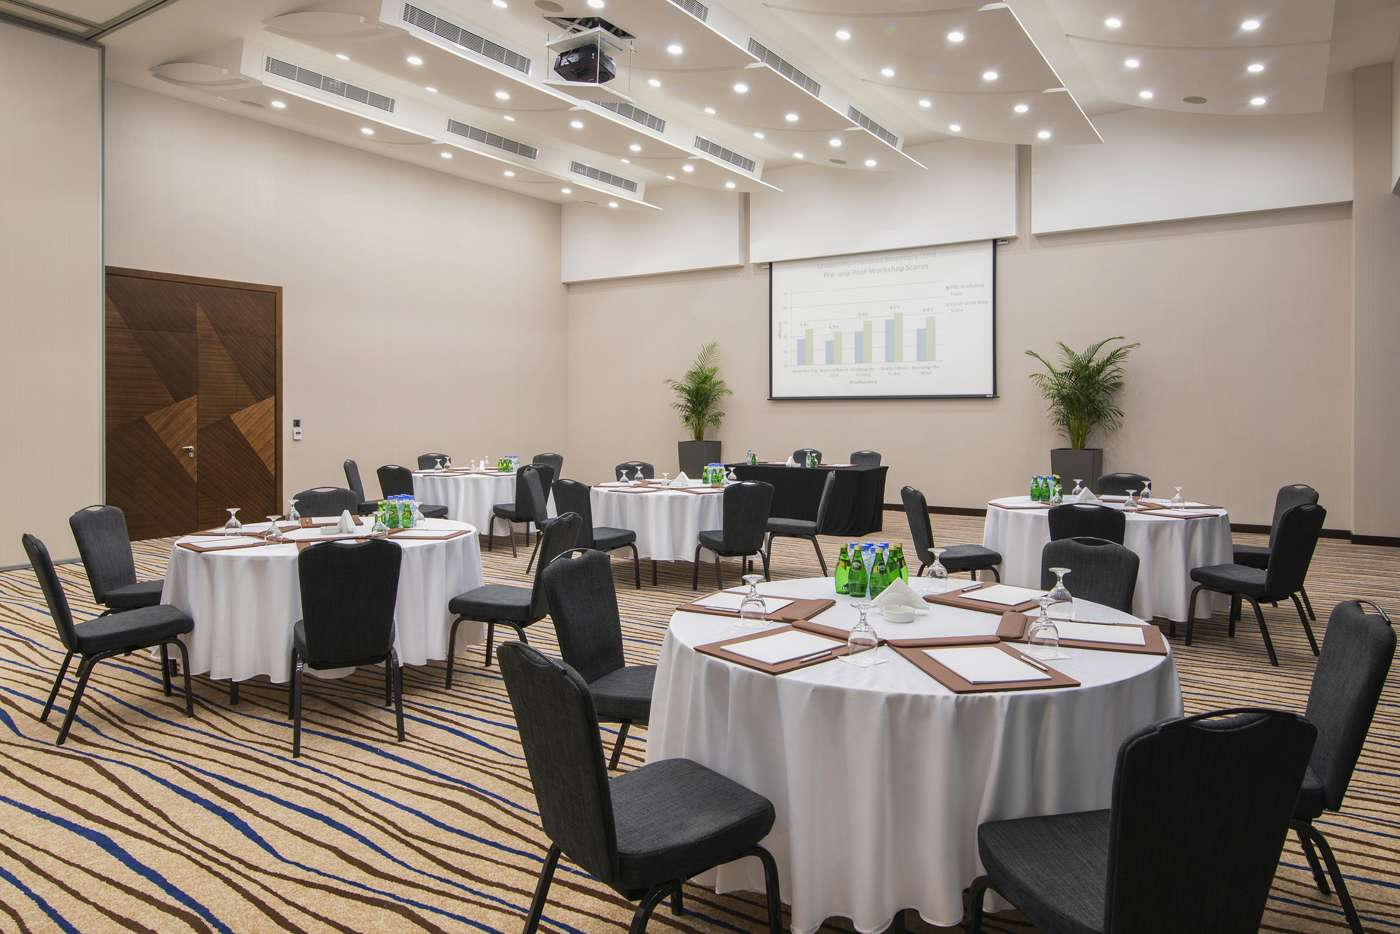 Hotel Supplies Abu Dhabi